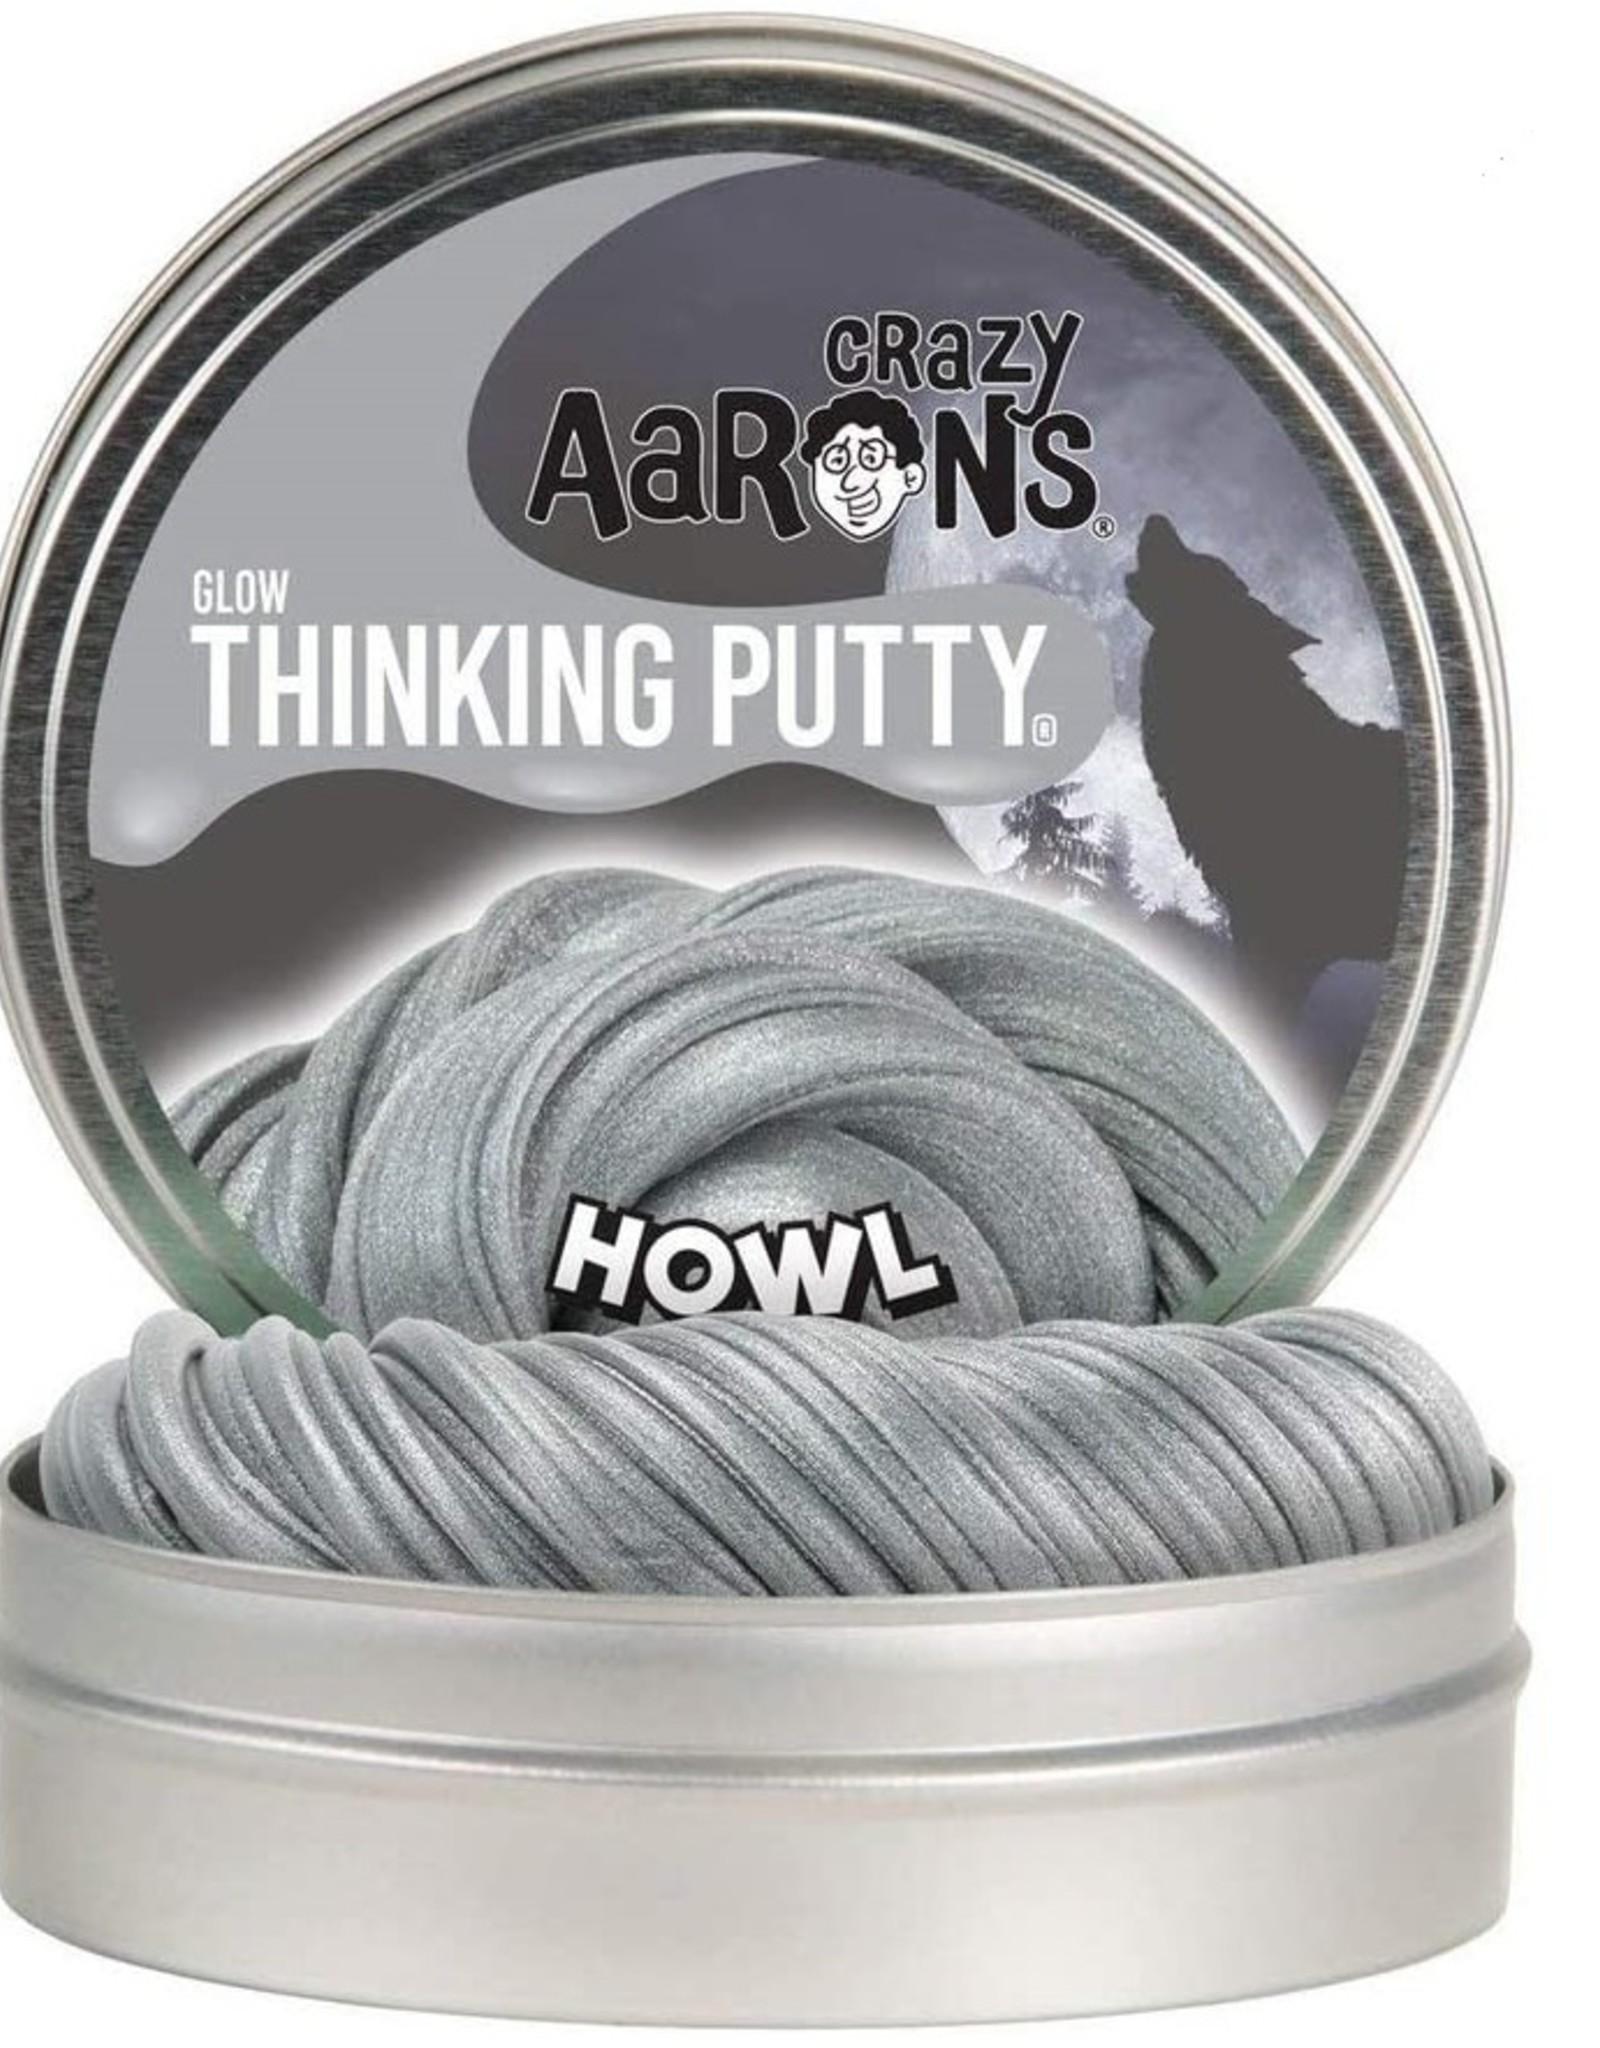 "Crazy Aaron's Thinking Putty Crazy Aaron's Glow-in-the-Dark Putty 4"" Tins"